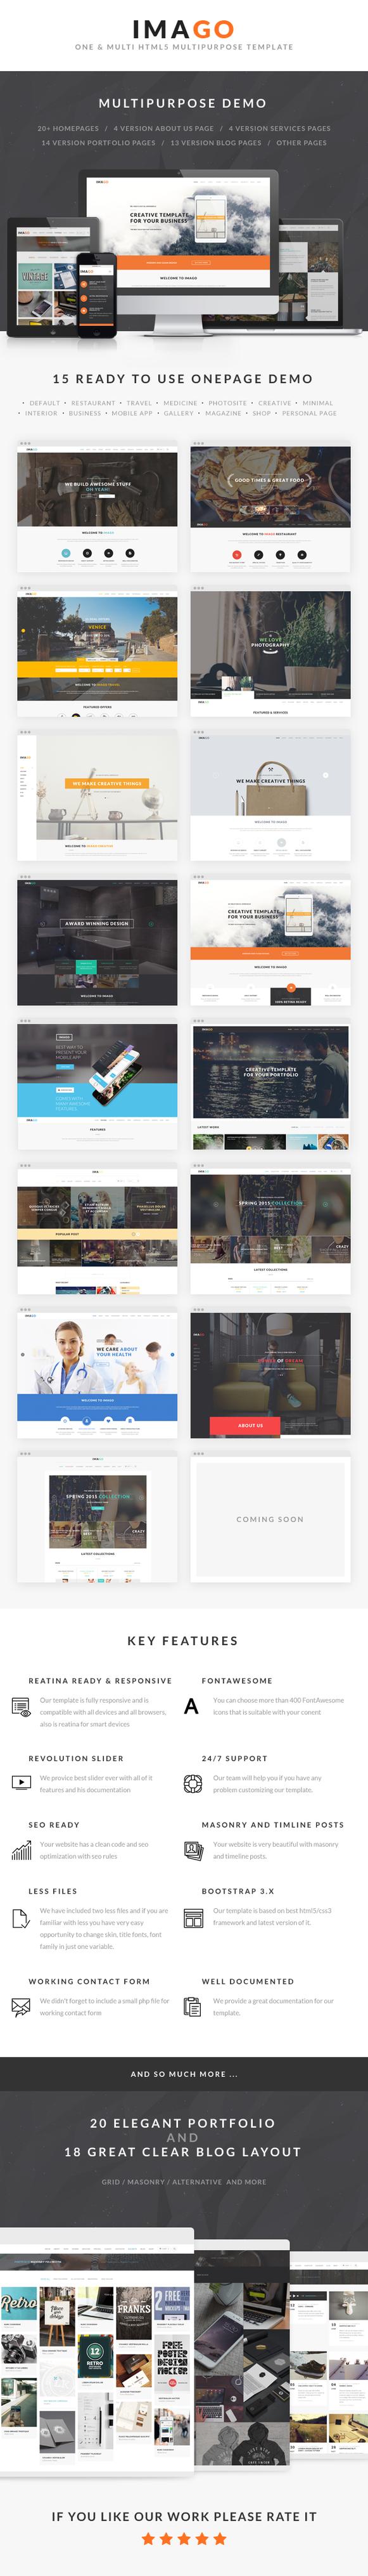 Imago - Multipurpose HTML5 Template - 1